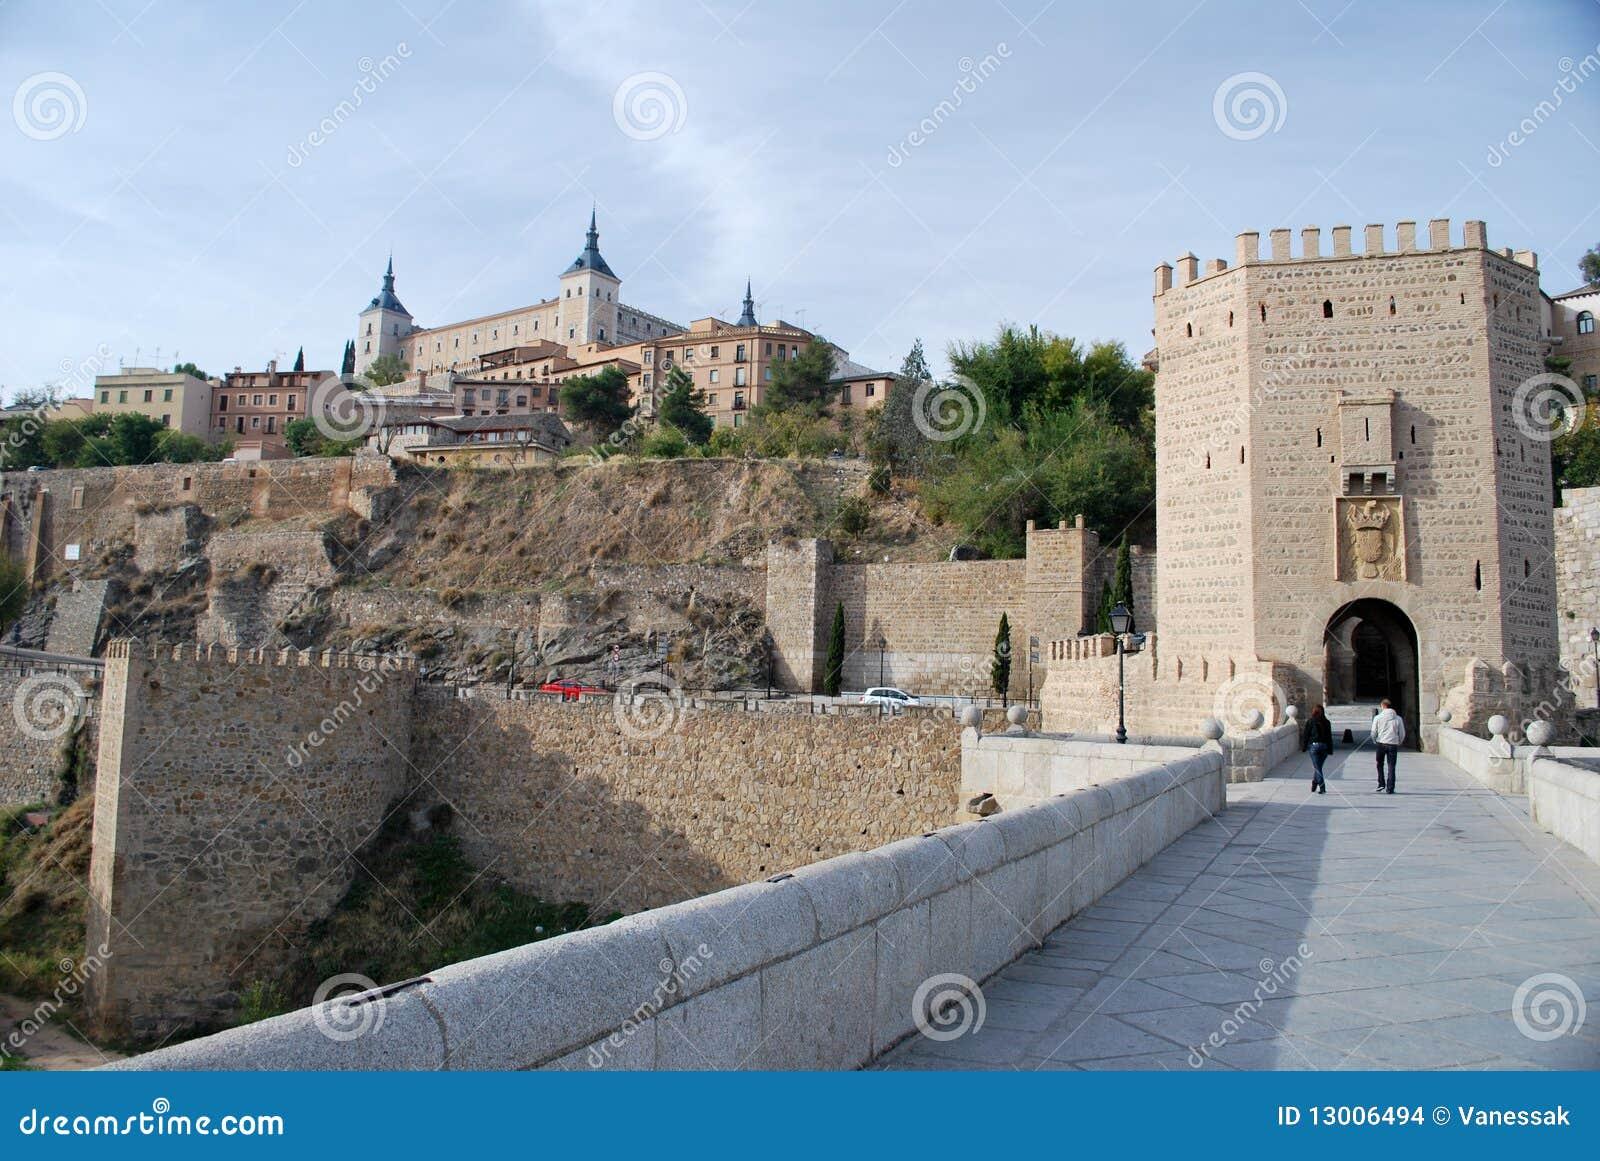 The bridge of Toledo in Spain